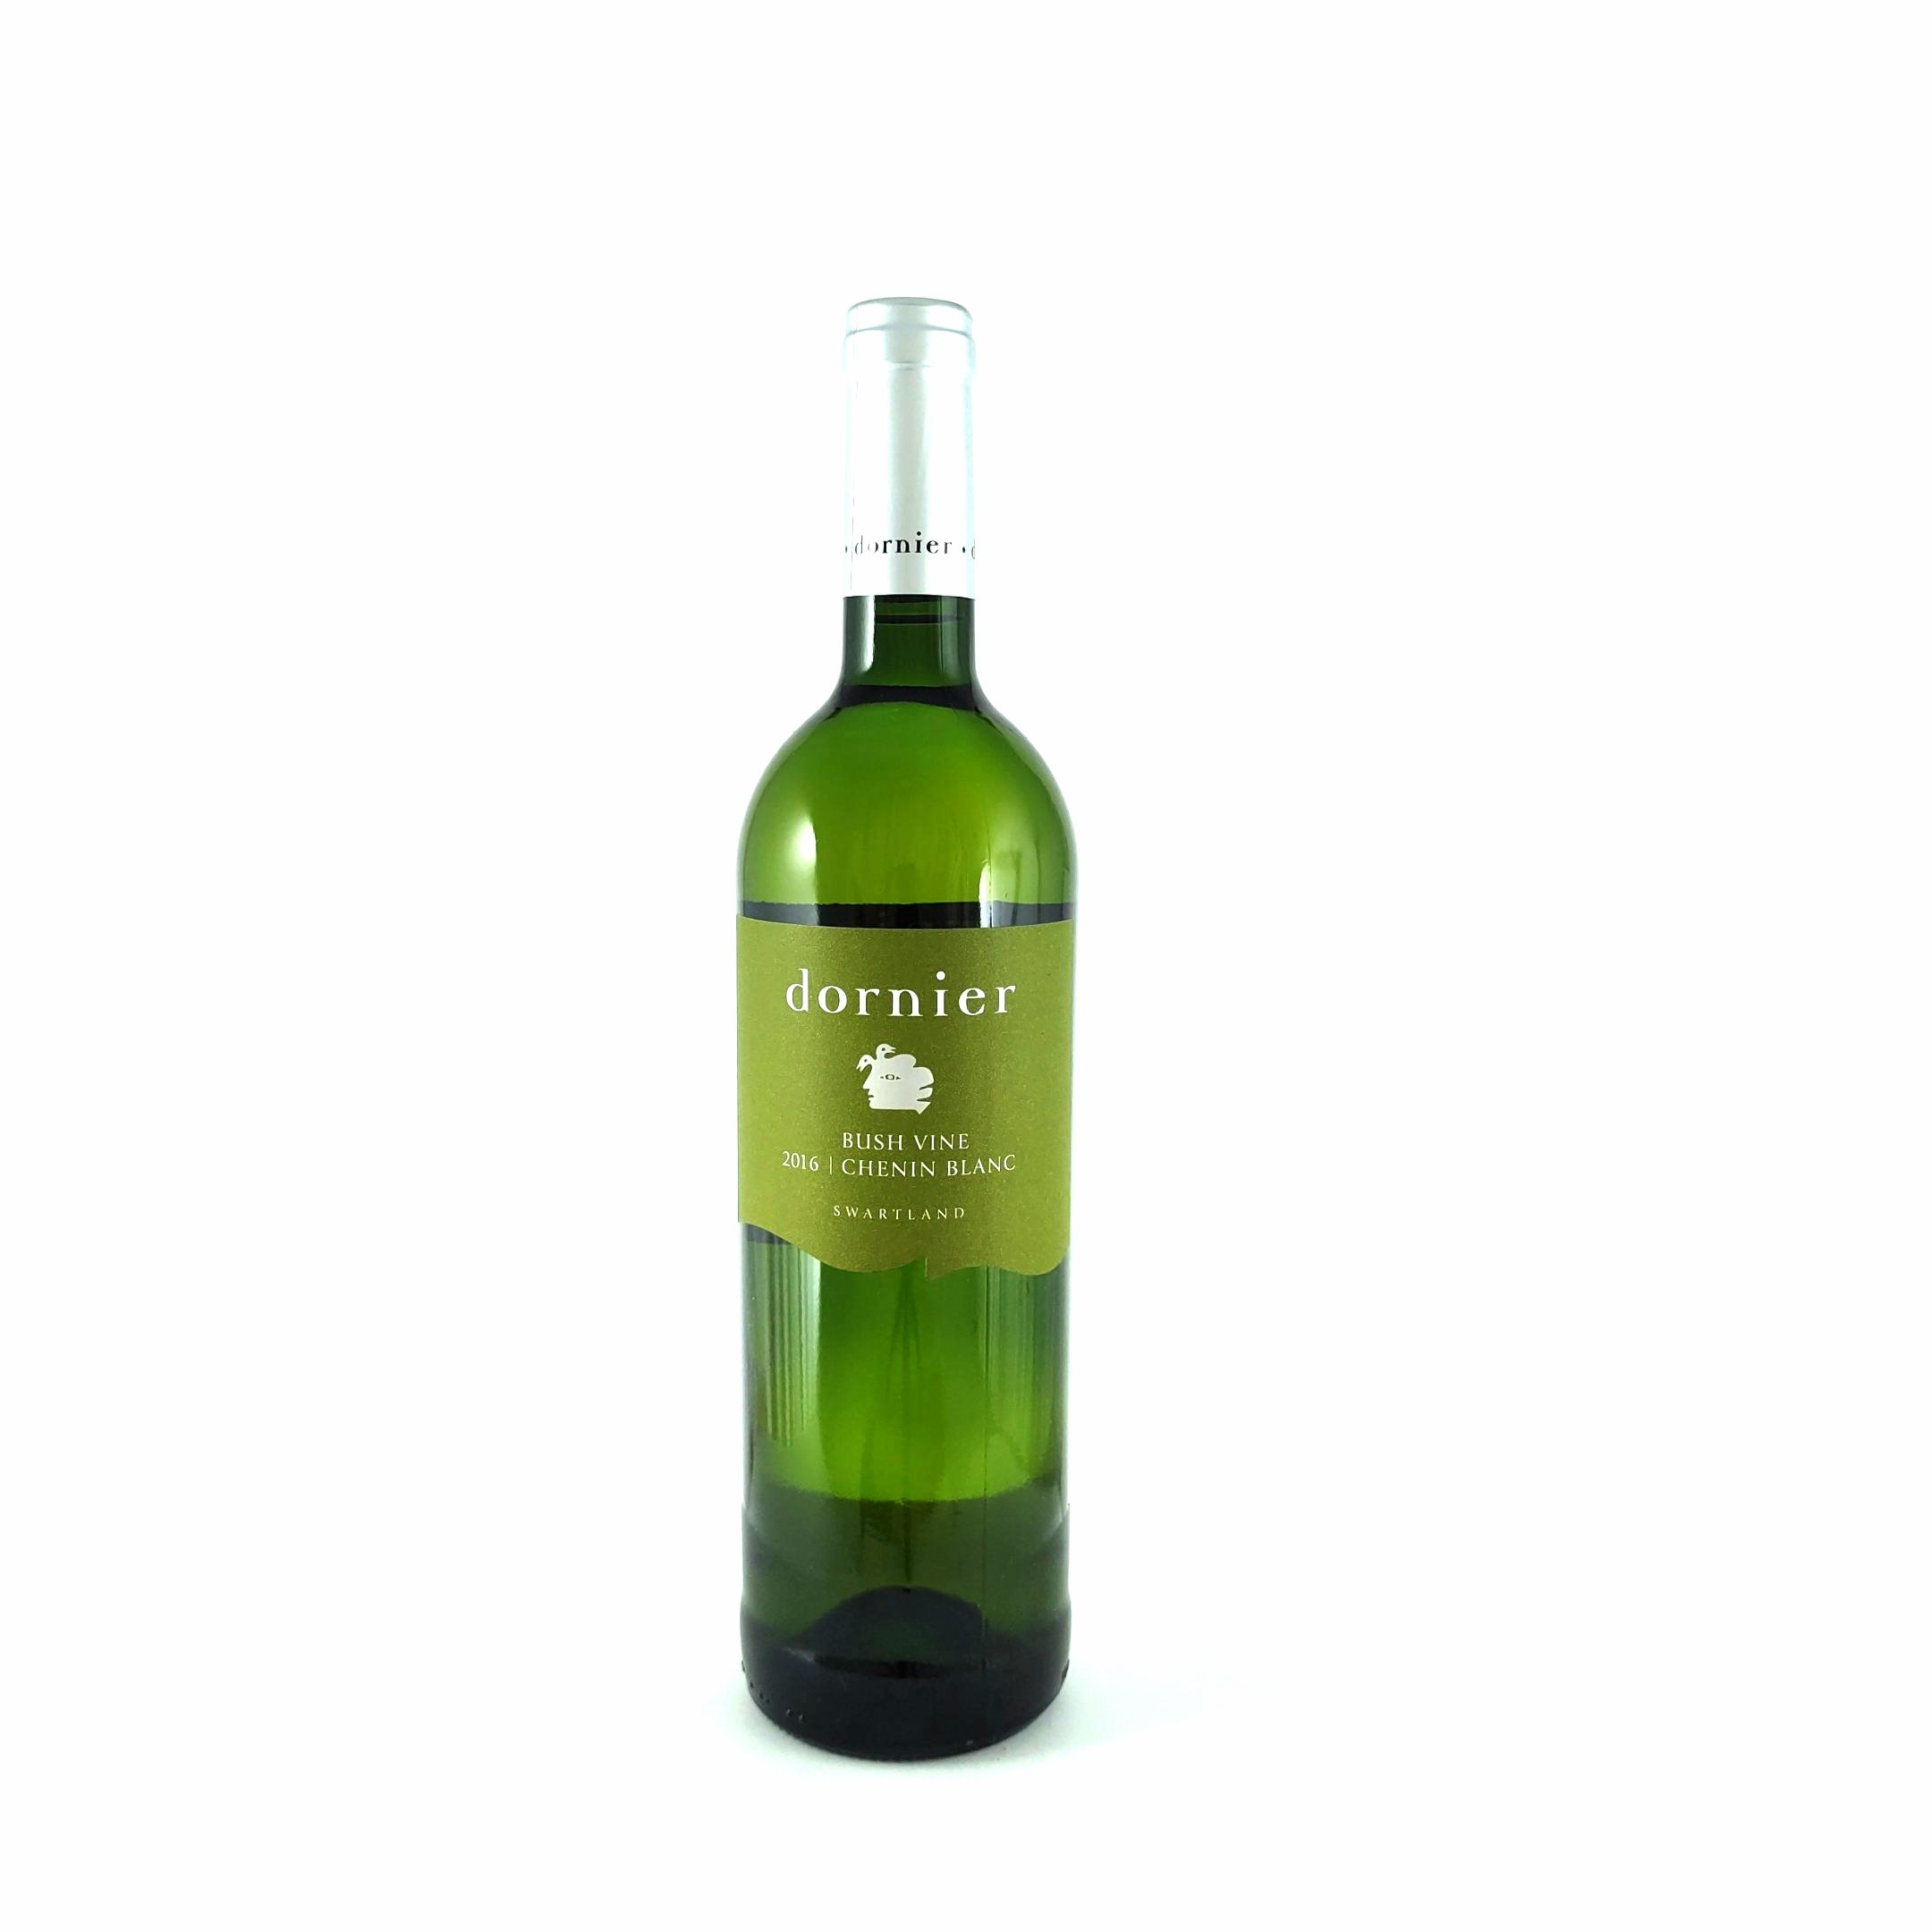 Dornier – Chenin Blanc 2016